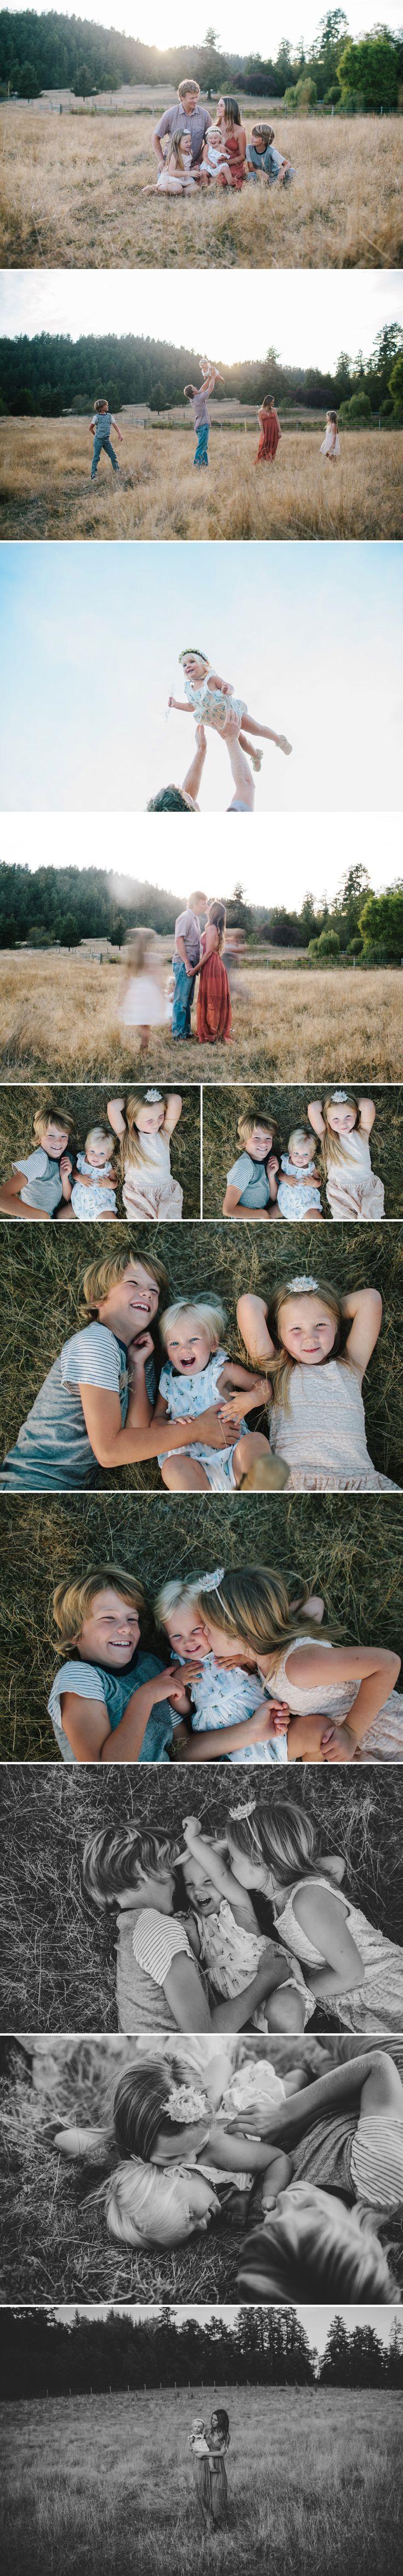 Die besten 25 familienbilder drau en ideen auf pinterest familien portr ts drau en familien - Familienbilder ideen ...